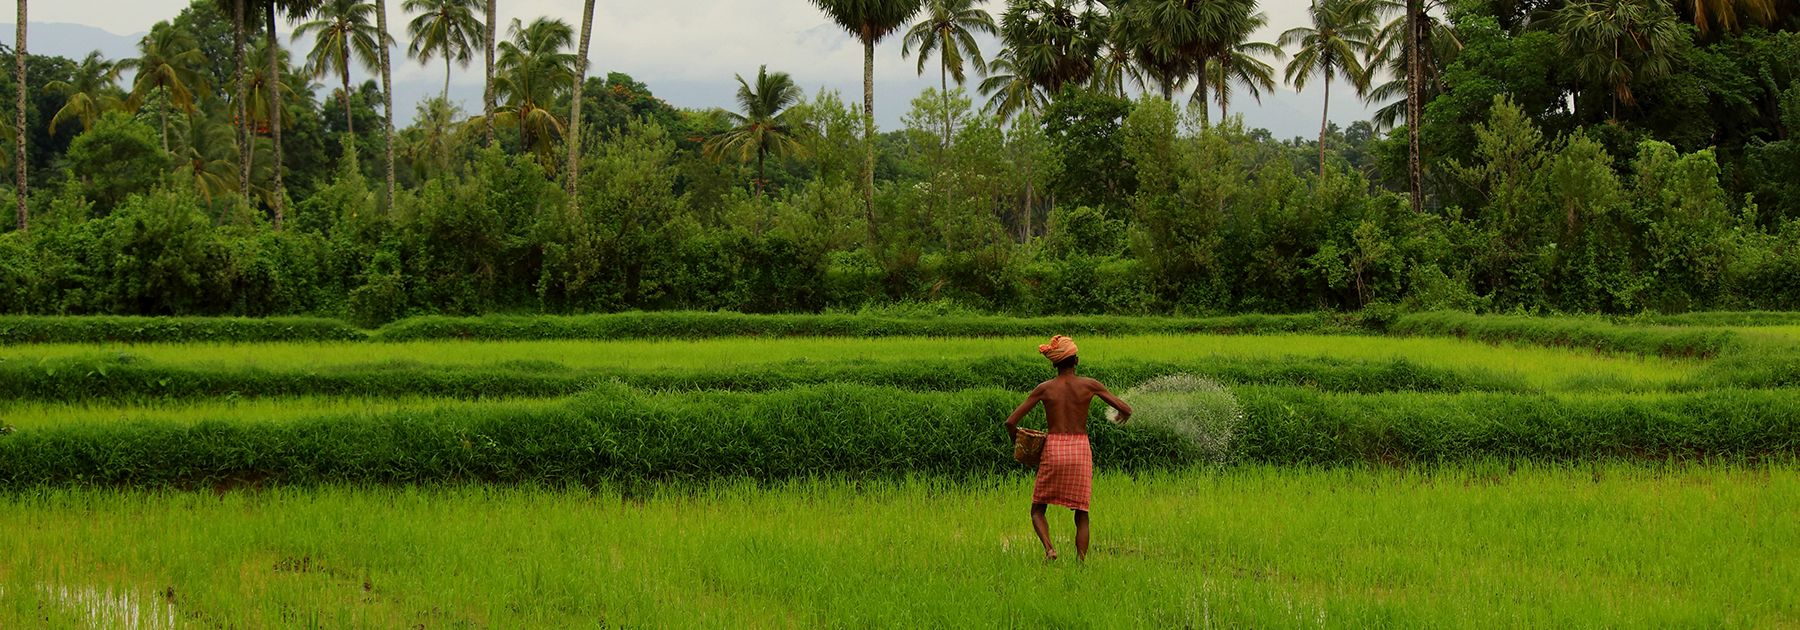 Fertilizing a rice paddy in Kerala.